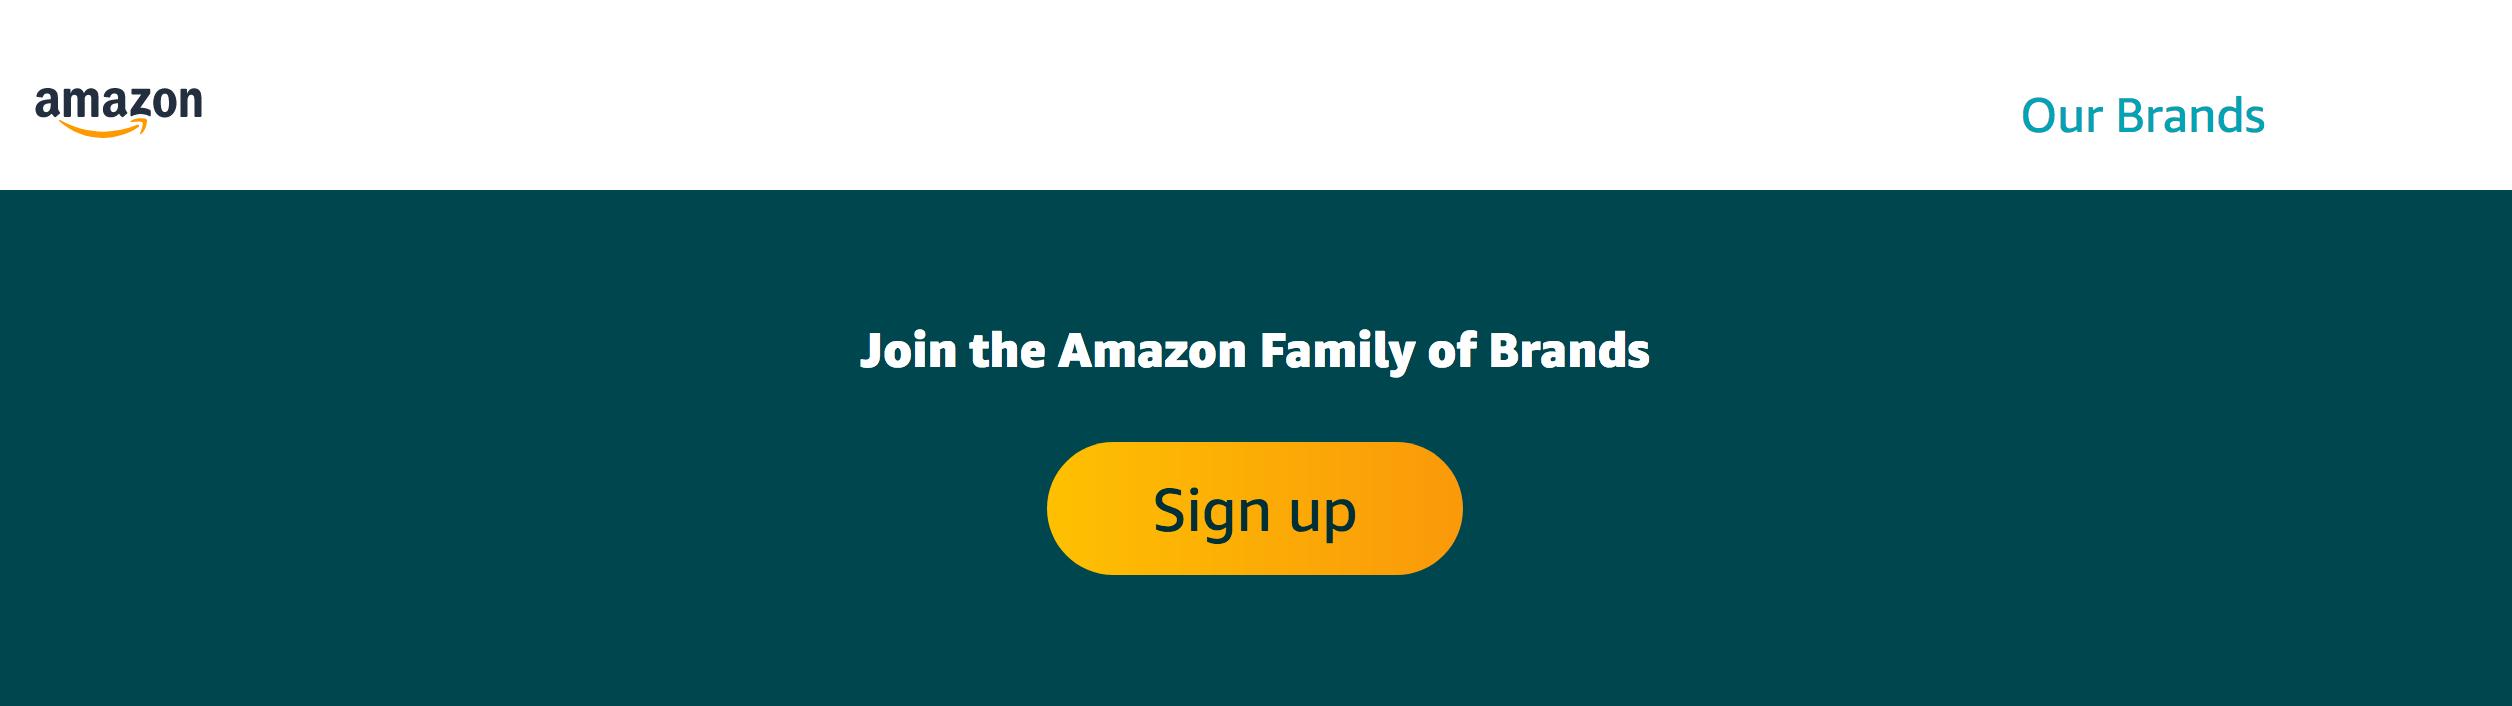 Amazon accelerator program